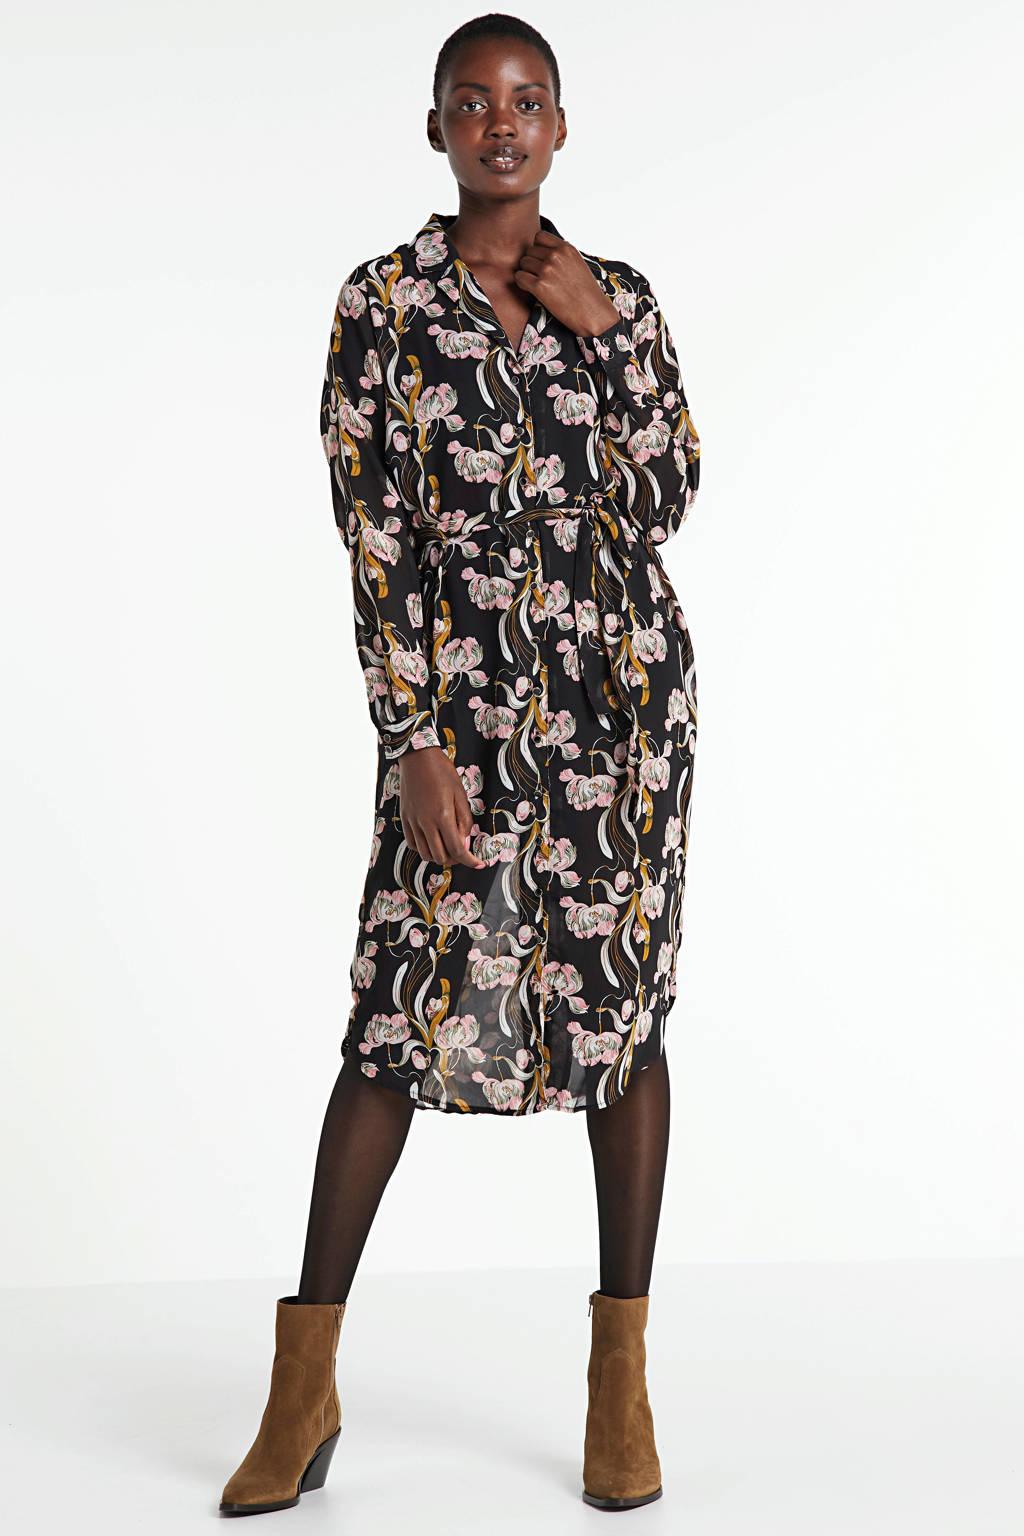 OBJECT gebloemde blousejurk Cinna zwart/roze/geel, Zwart/roze/geel